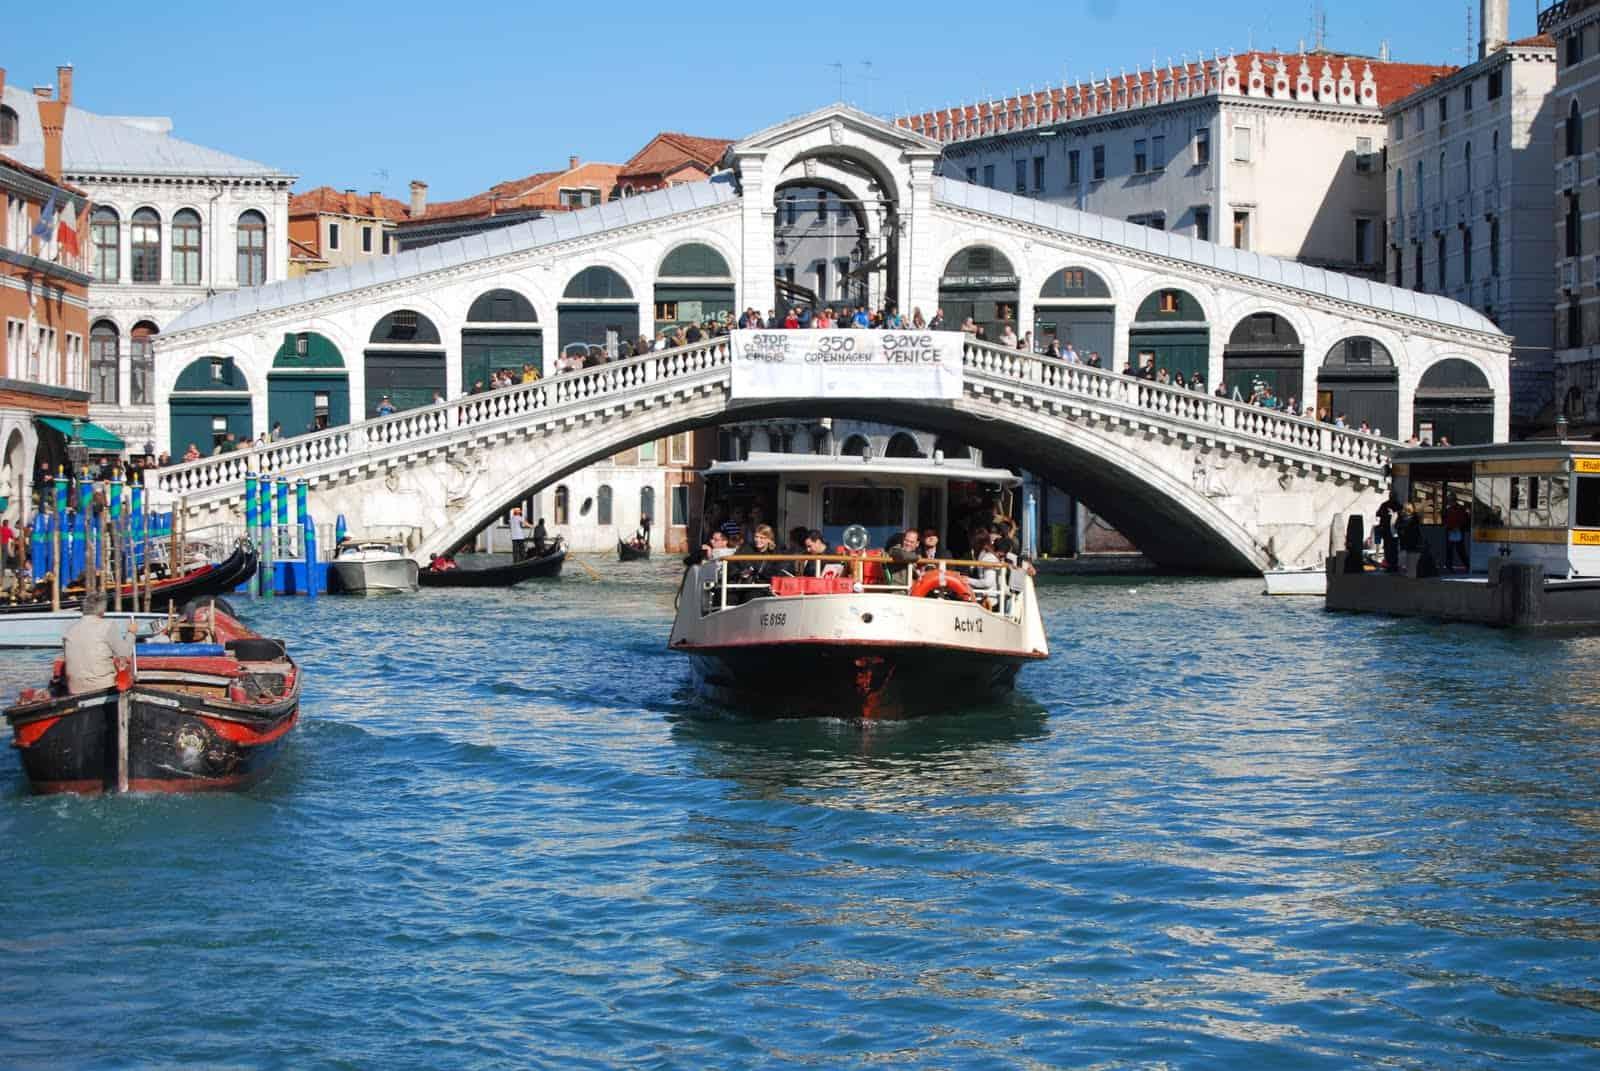 vaporetto-rialto-bridge